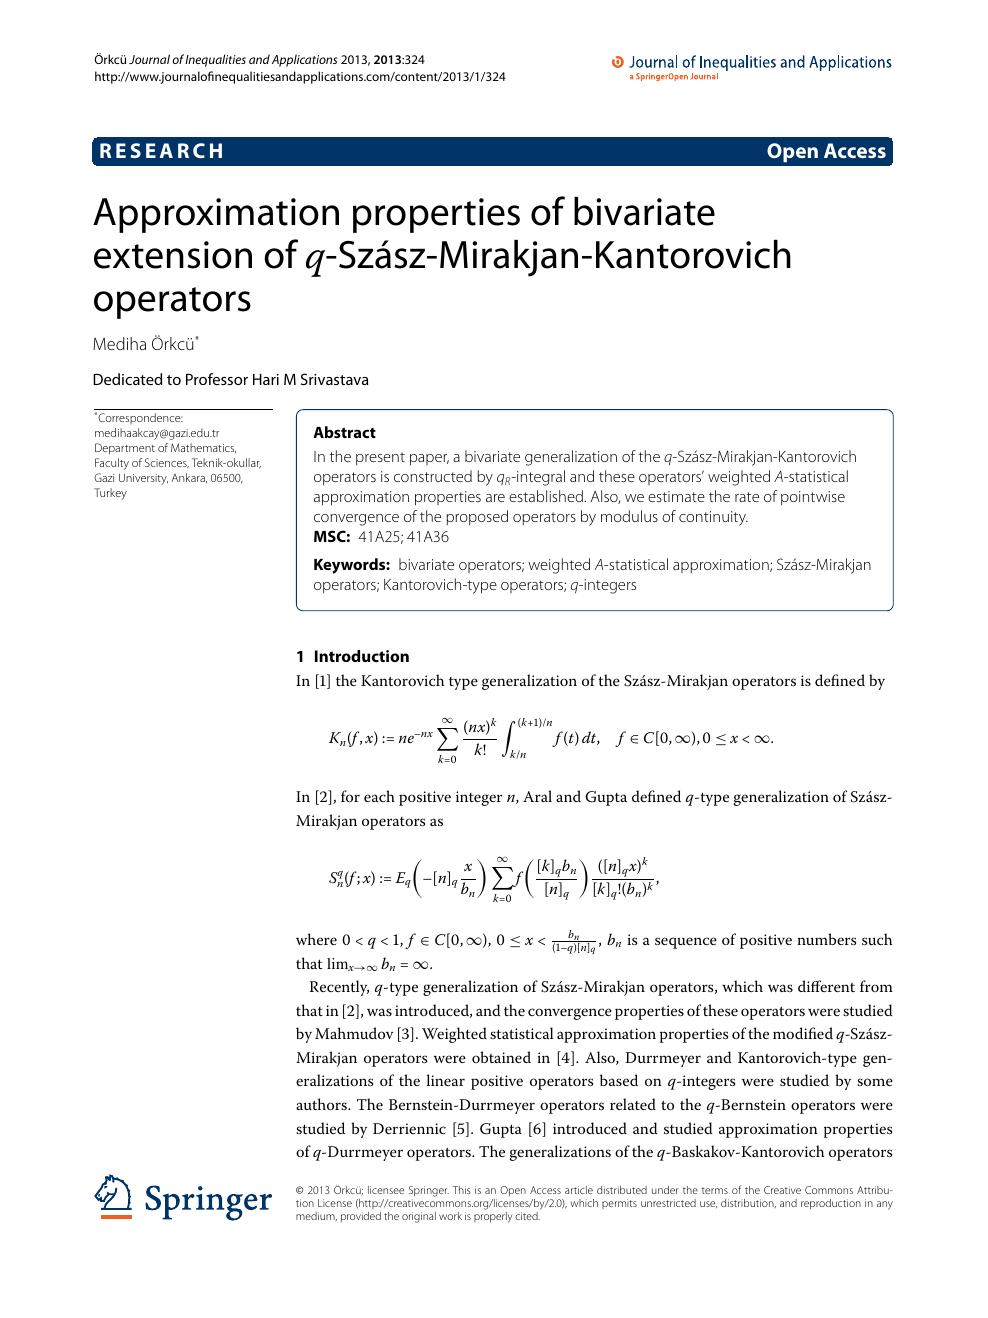 Approximation properties of bivariate extension of q-Szász-Mirakjan